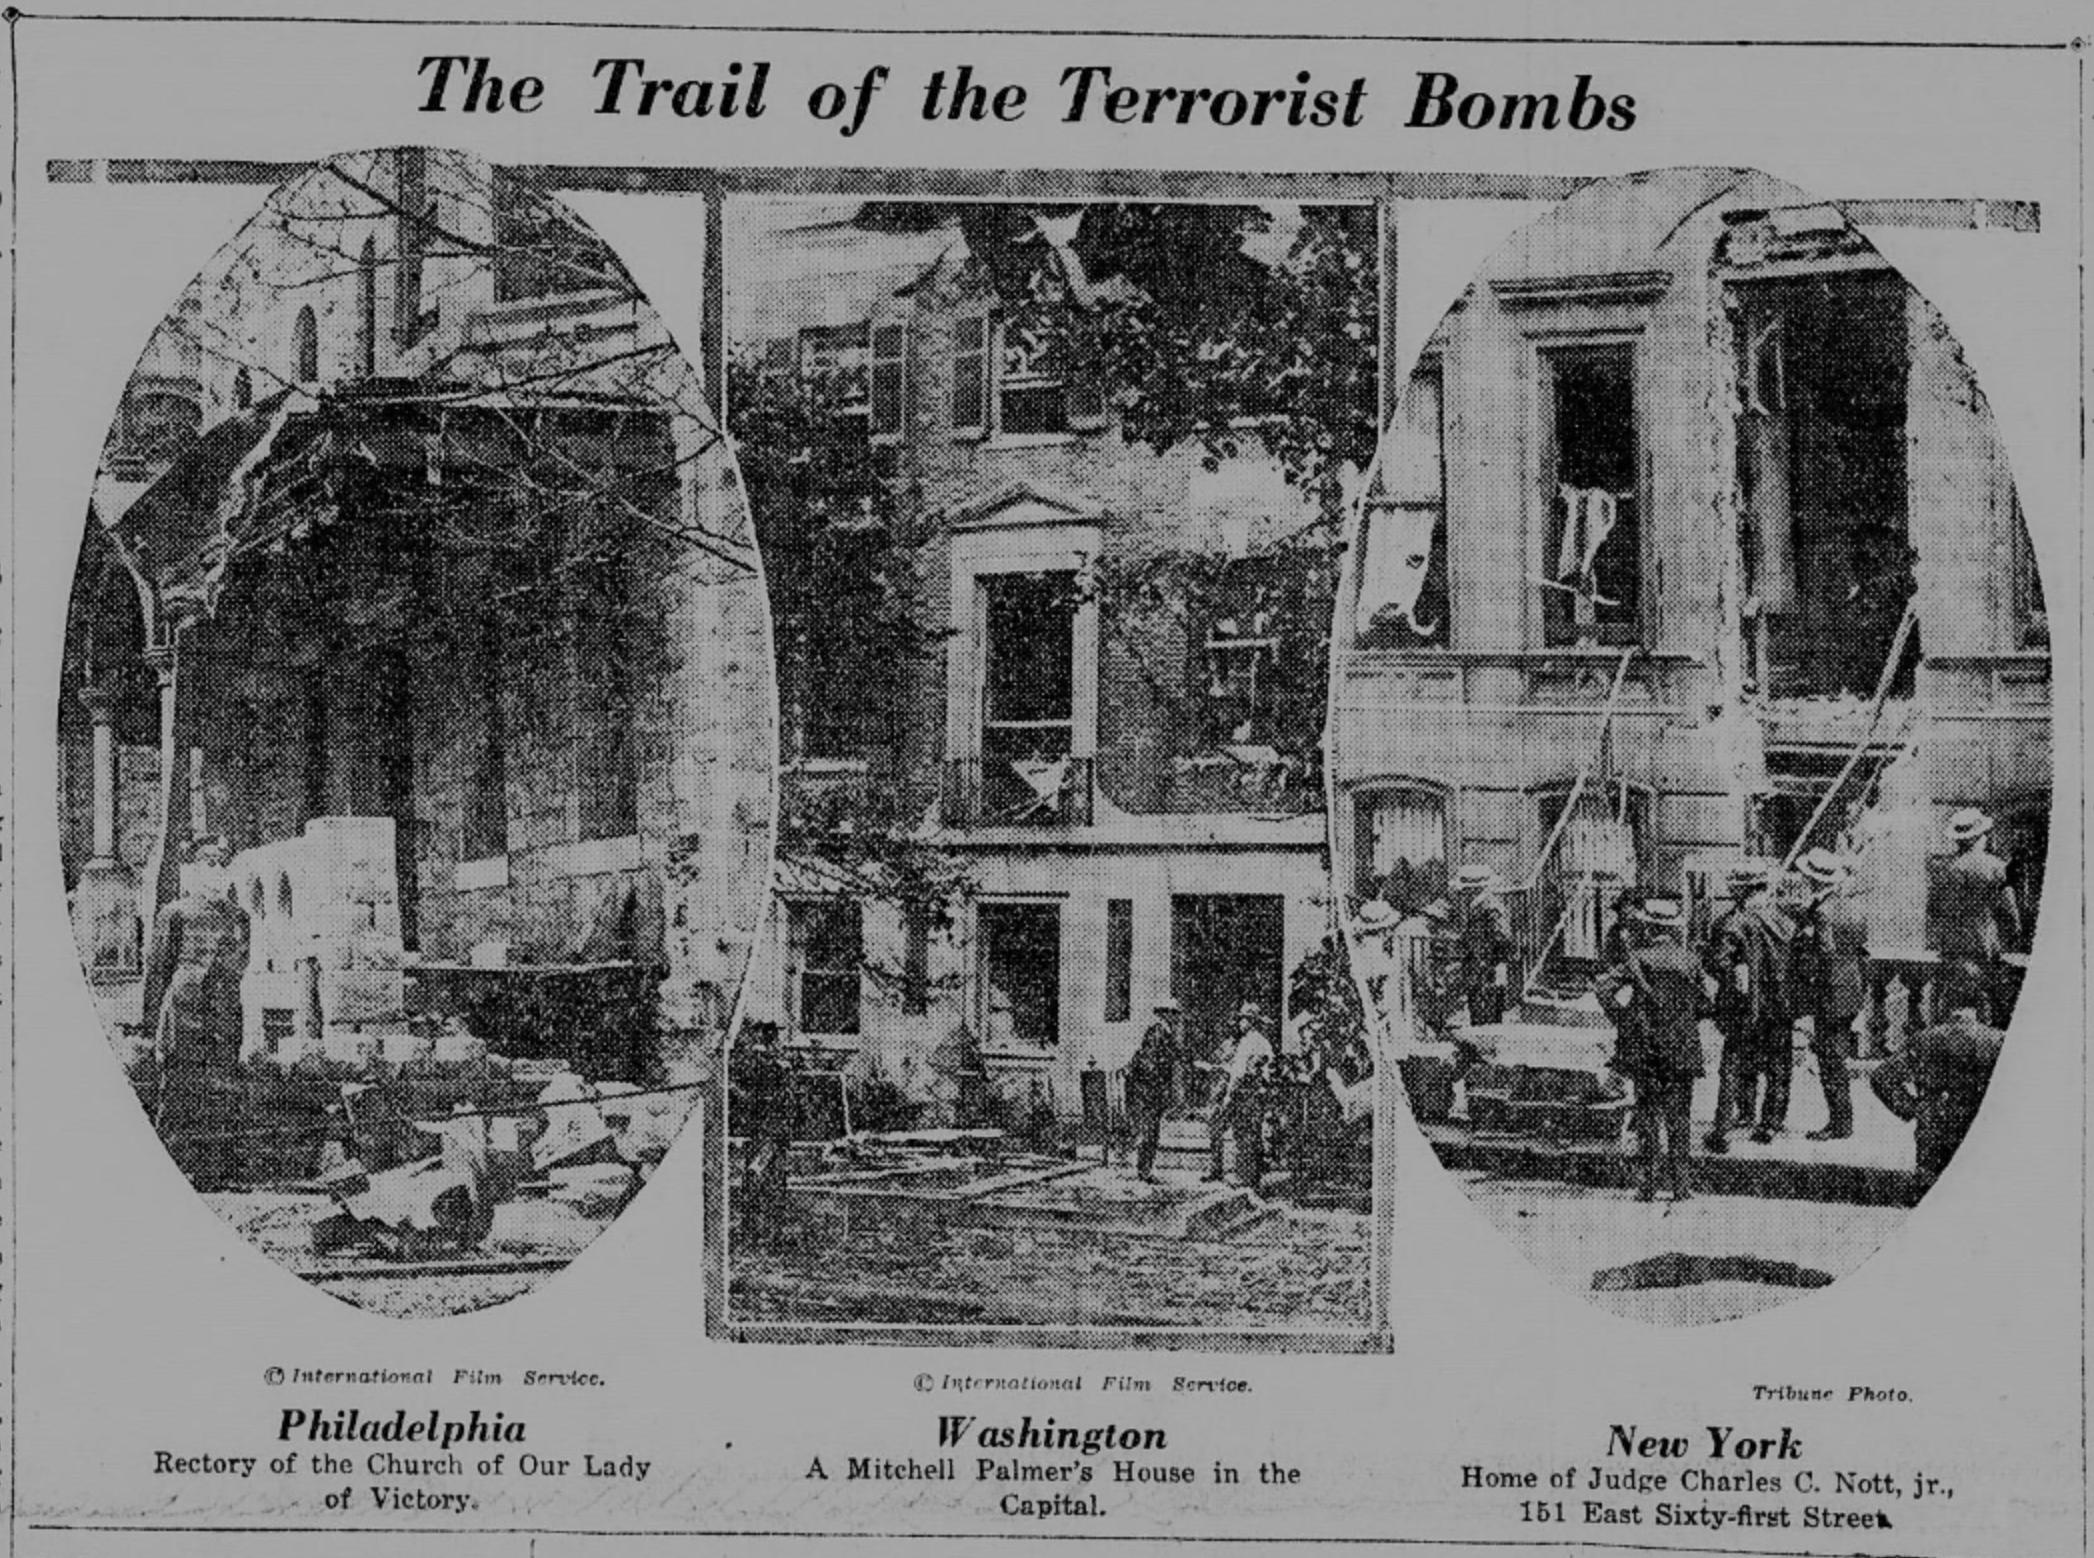 1919 United States anarchist bombings - Wikipedia